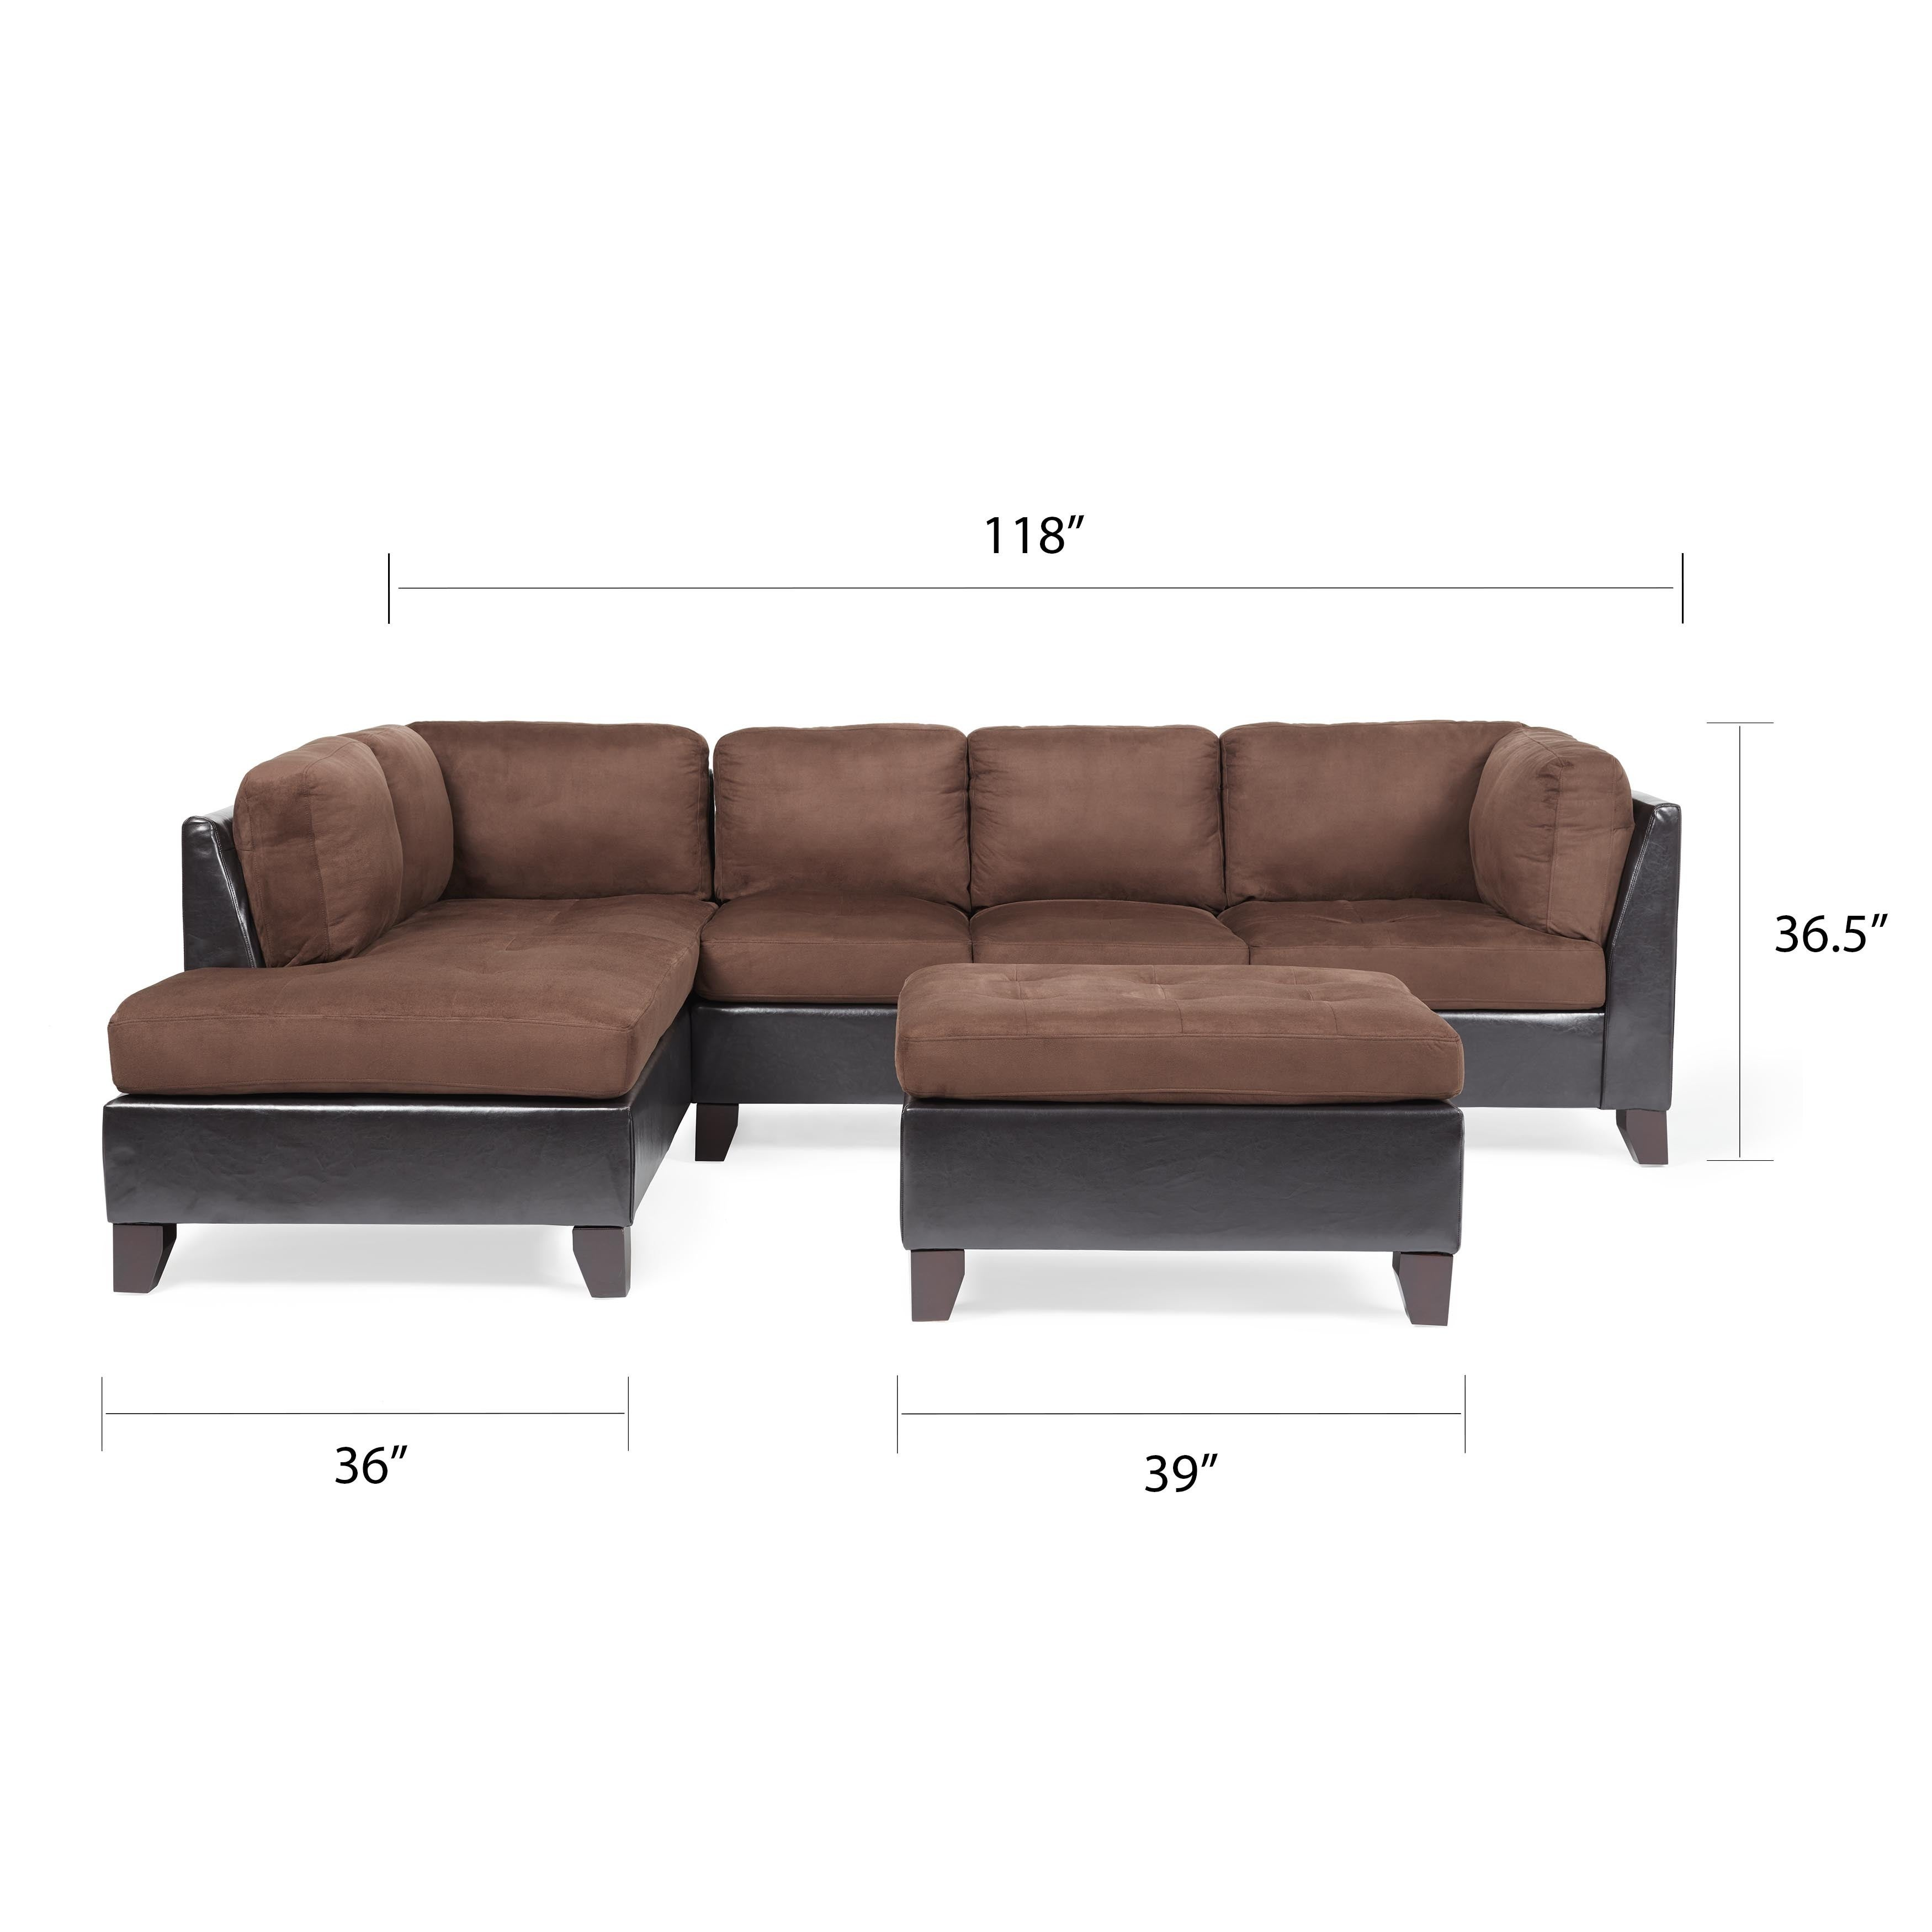 Shop Abbyson Charlotte Dark Brown Sectional Sofa And Ottoman Free